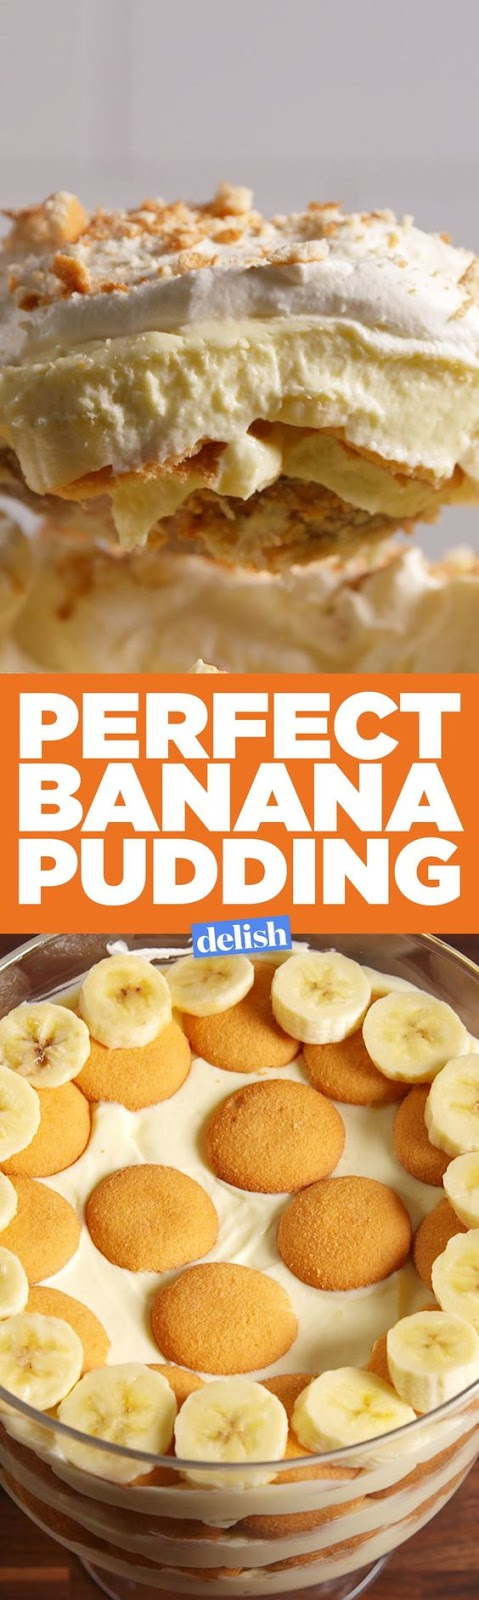 Perfect Banana Pudding